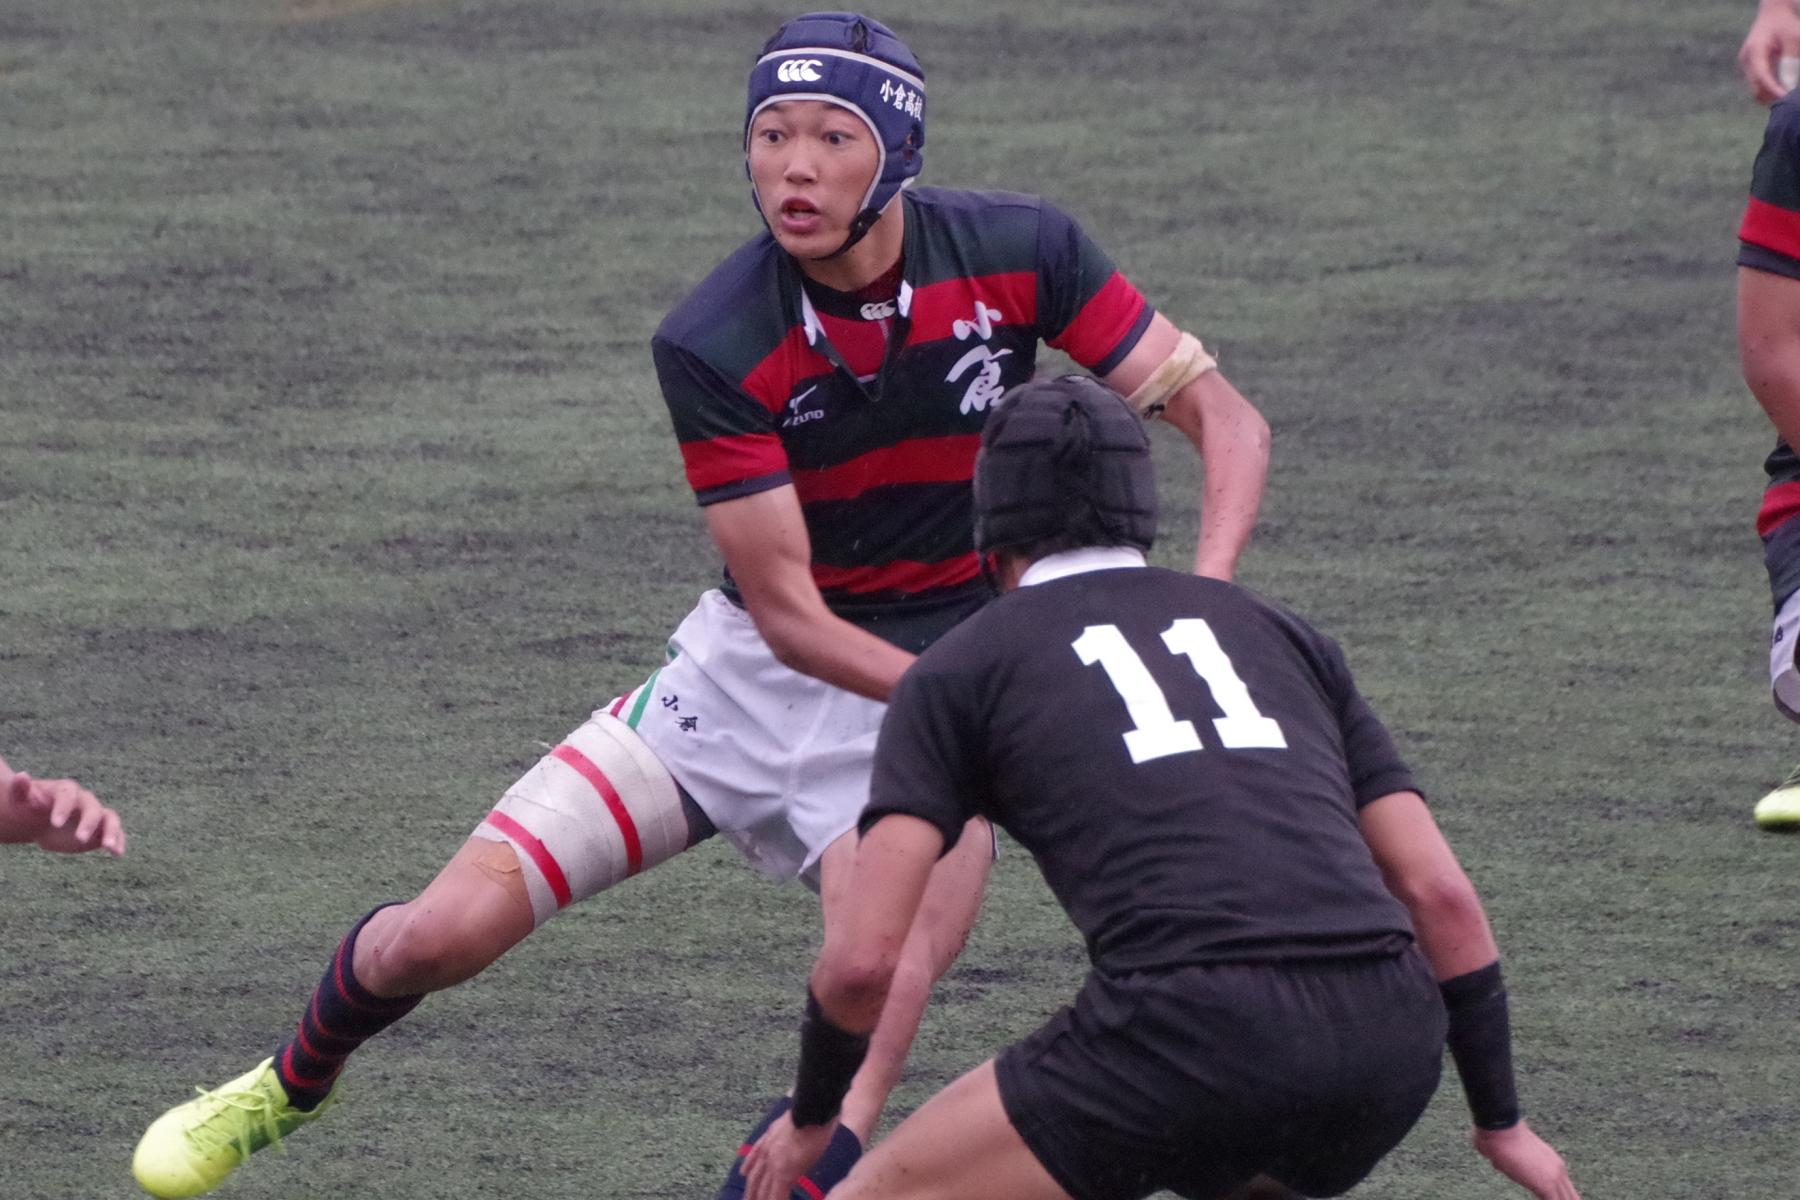 http://kokura-rugby.sakura.ne.jp/180513_144640_0889.jpg